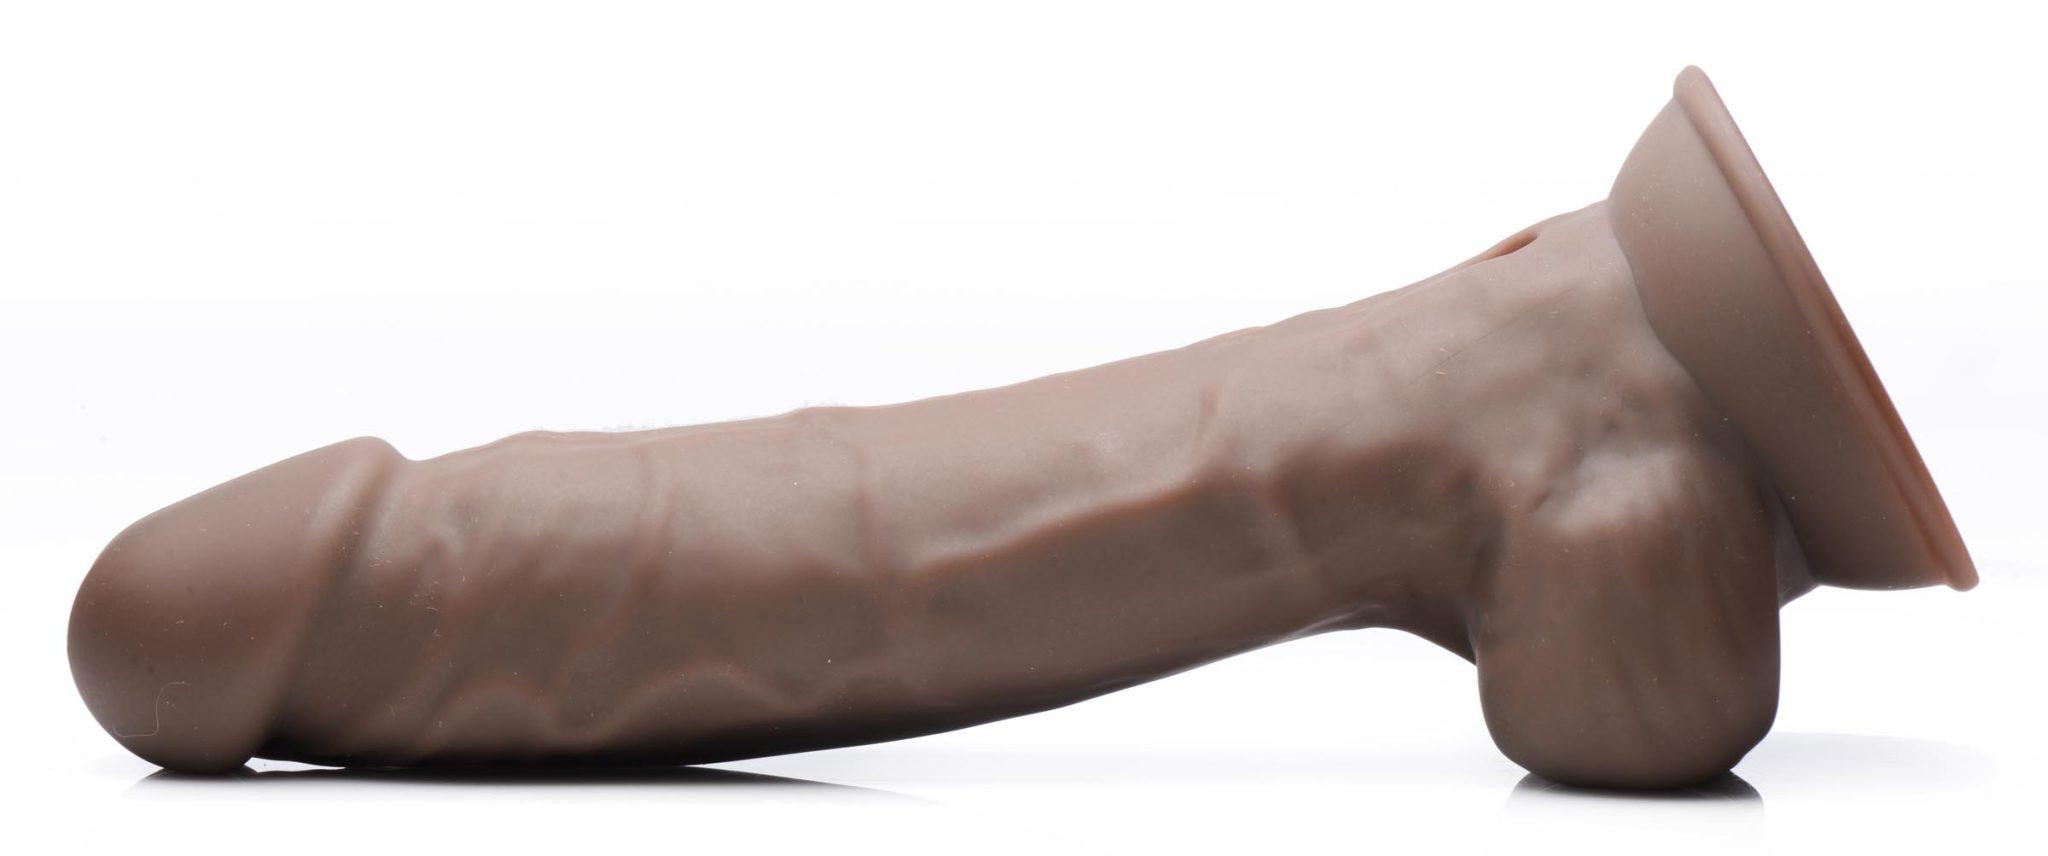 8 Inch Silexpan Hypoallergenic Silicone Vibrating Dildo – Dark